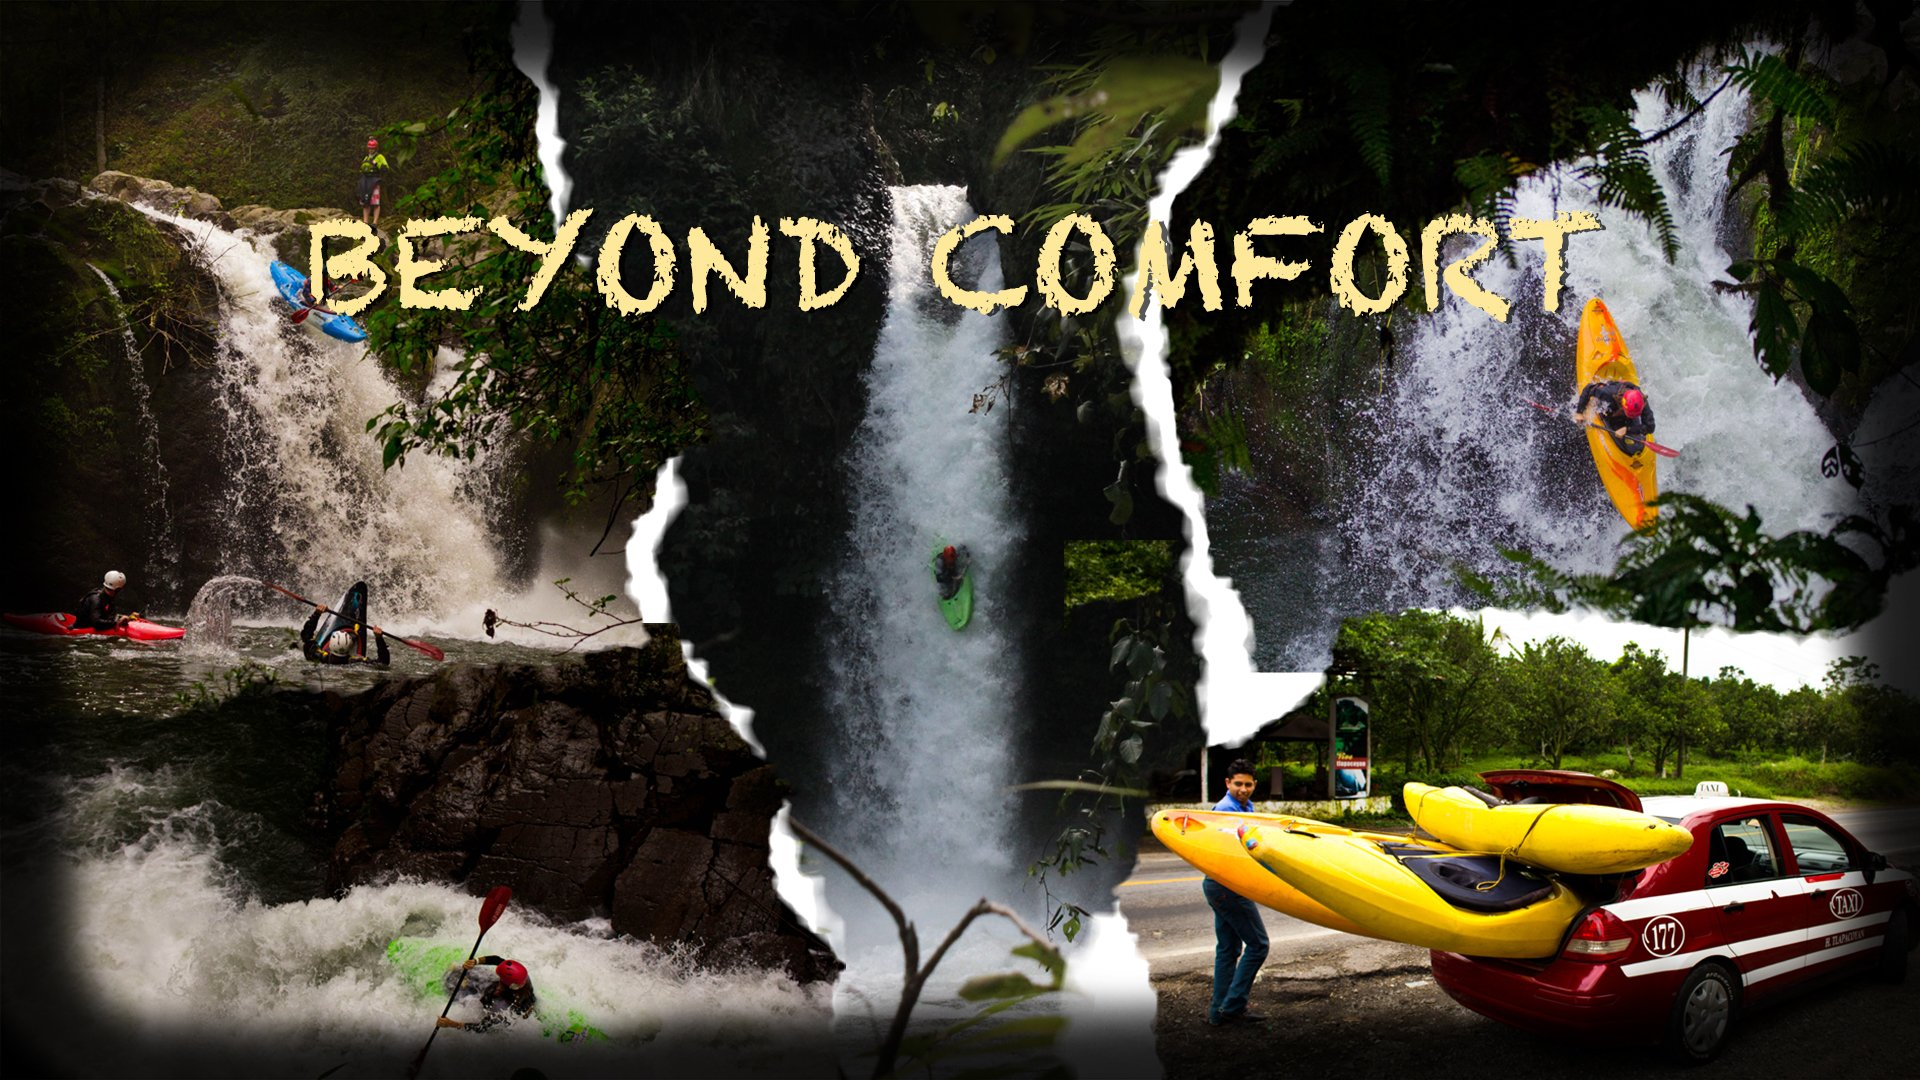 Ambassador Update | Beyond Comfort